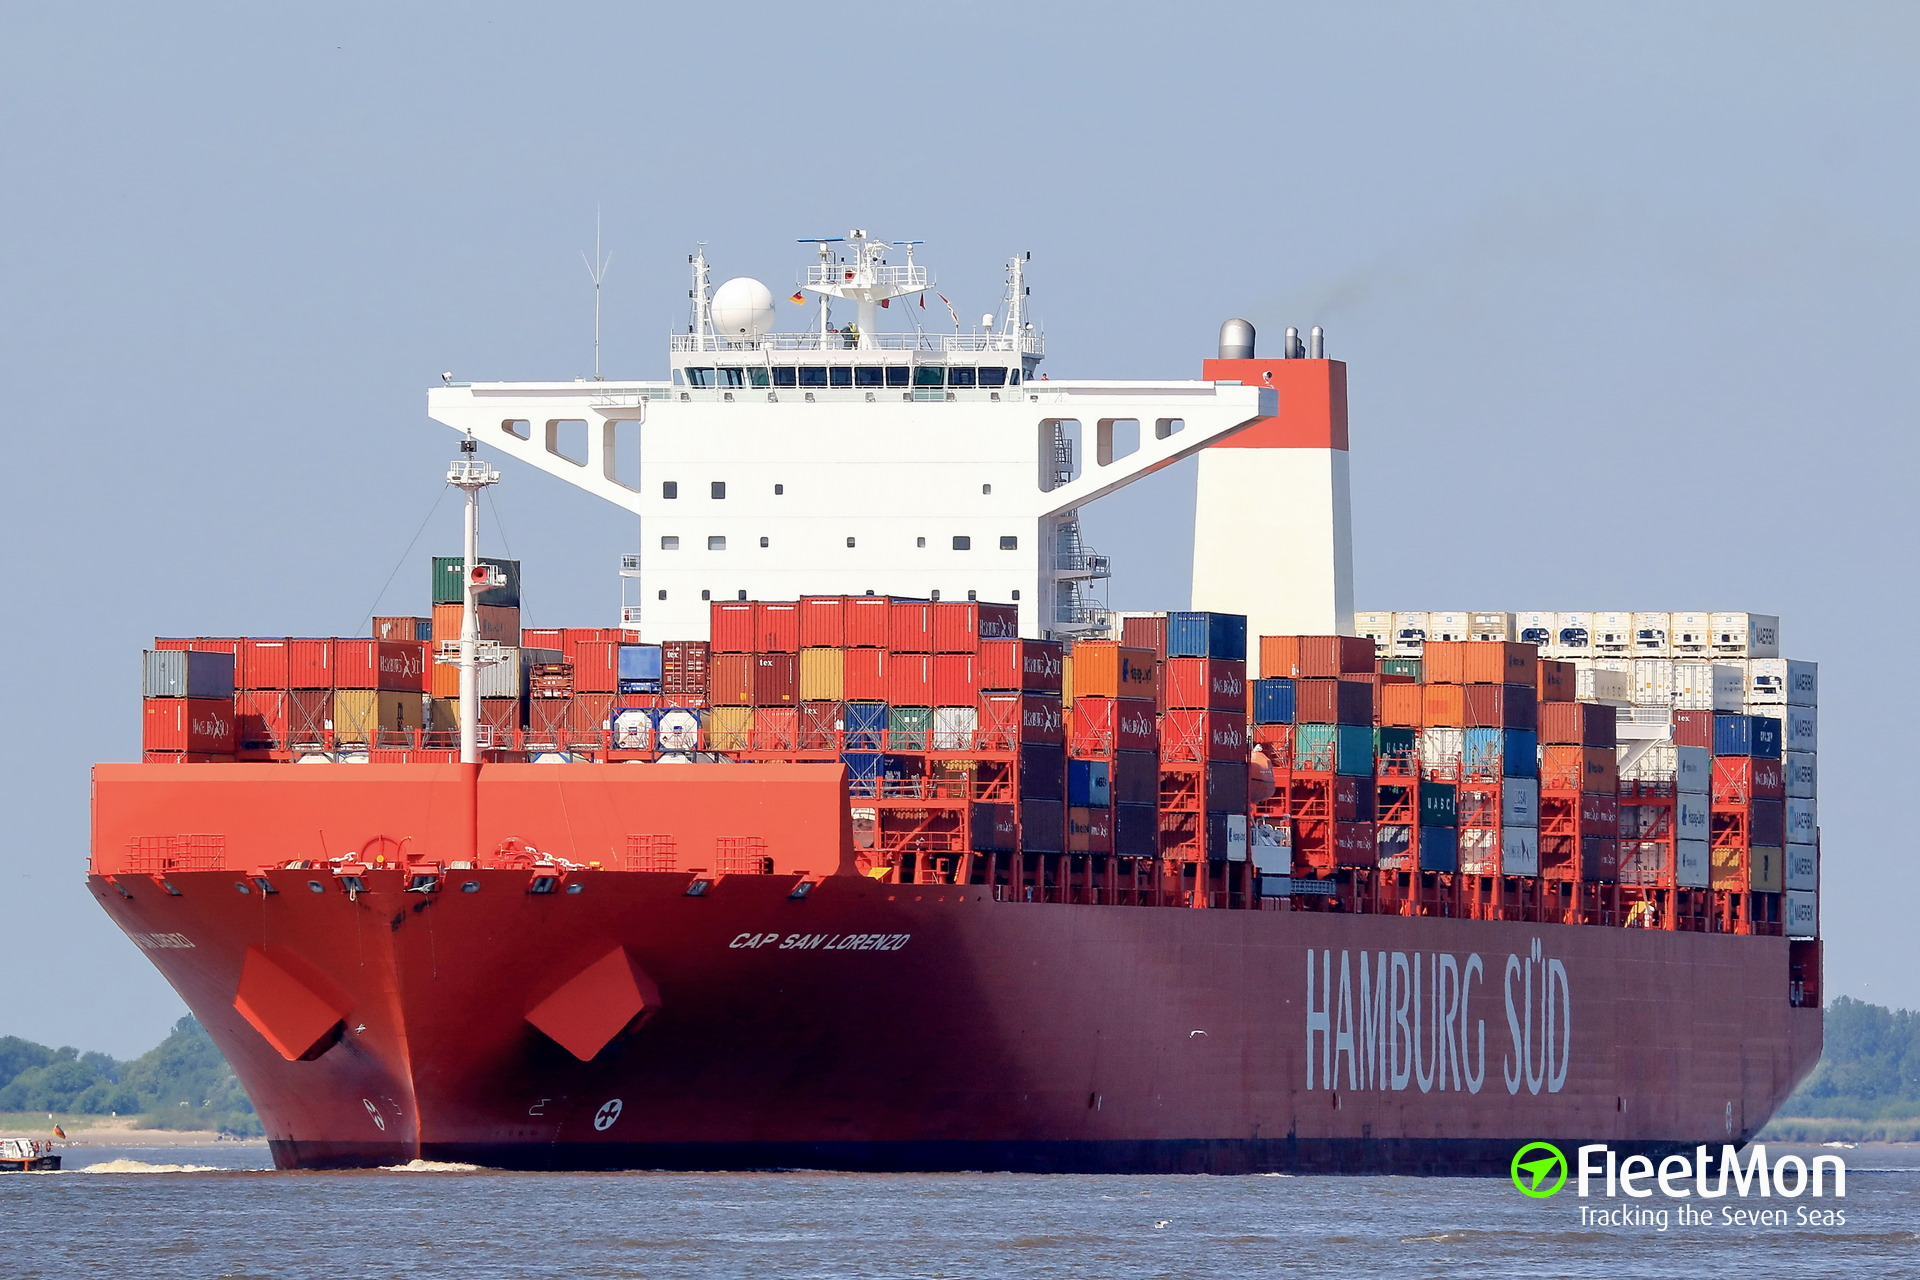 Boxship Cap San Lorenzo aground, Netherlands